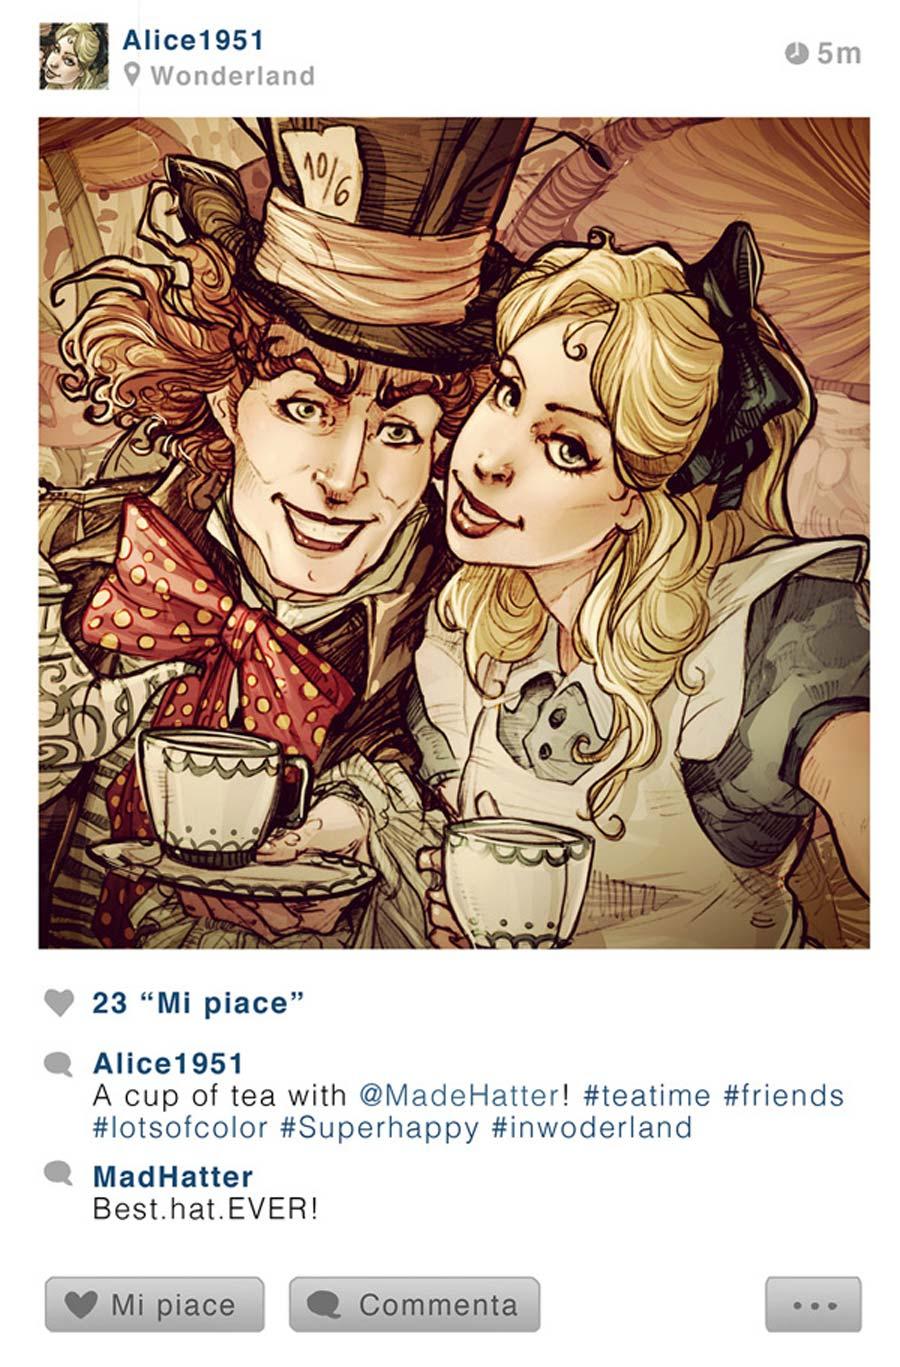 disney-instagram-alice